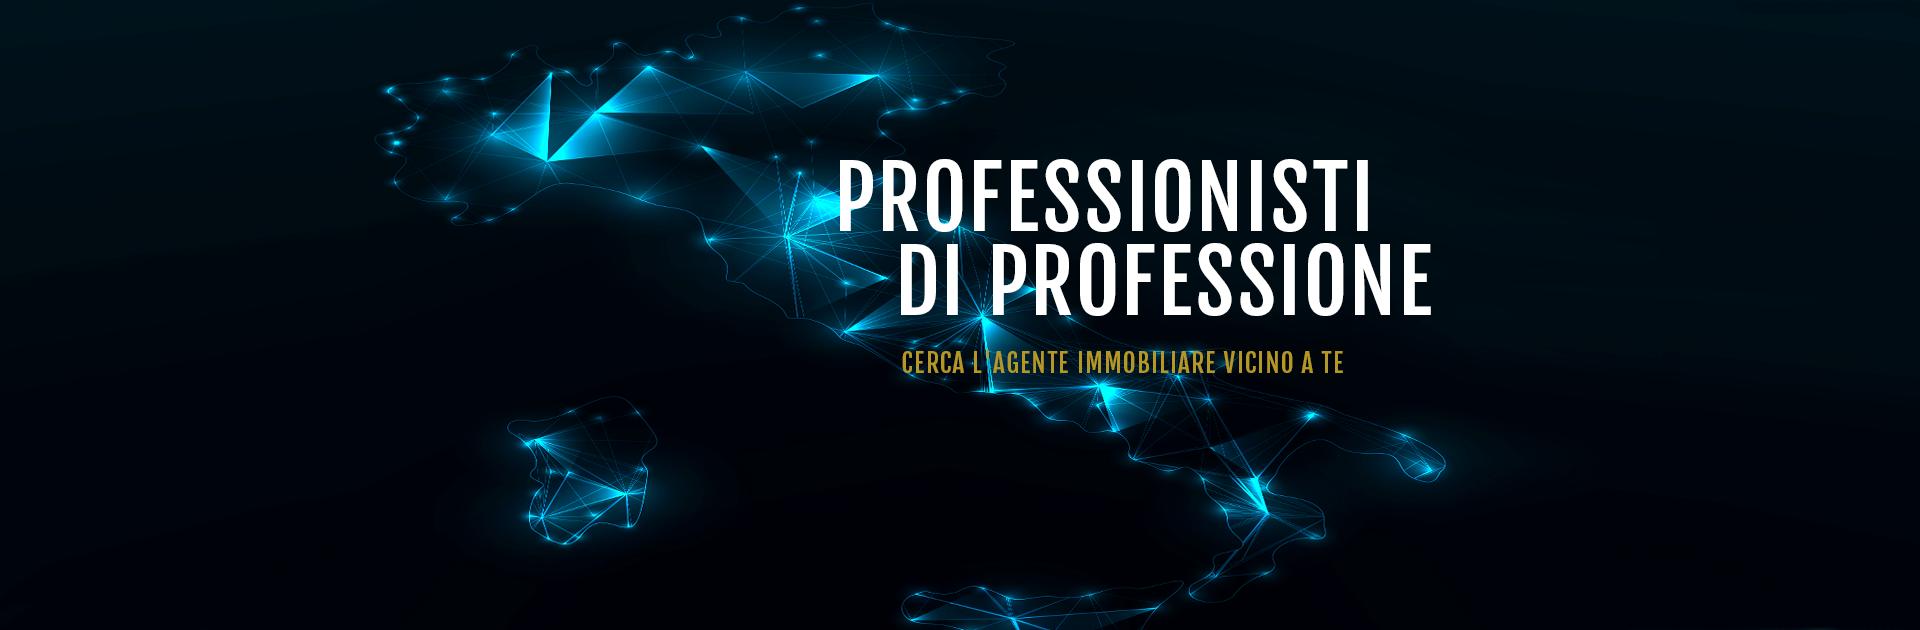 Agenti Immobiliari: UNAFiaip sbarca a Messina